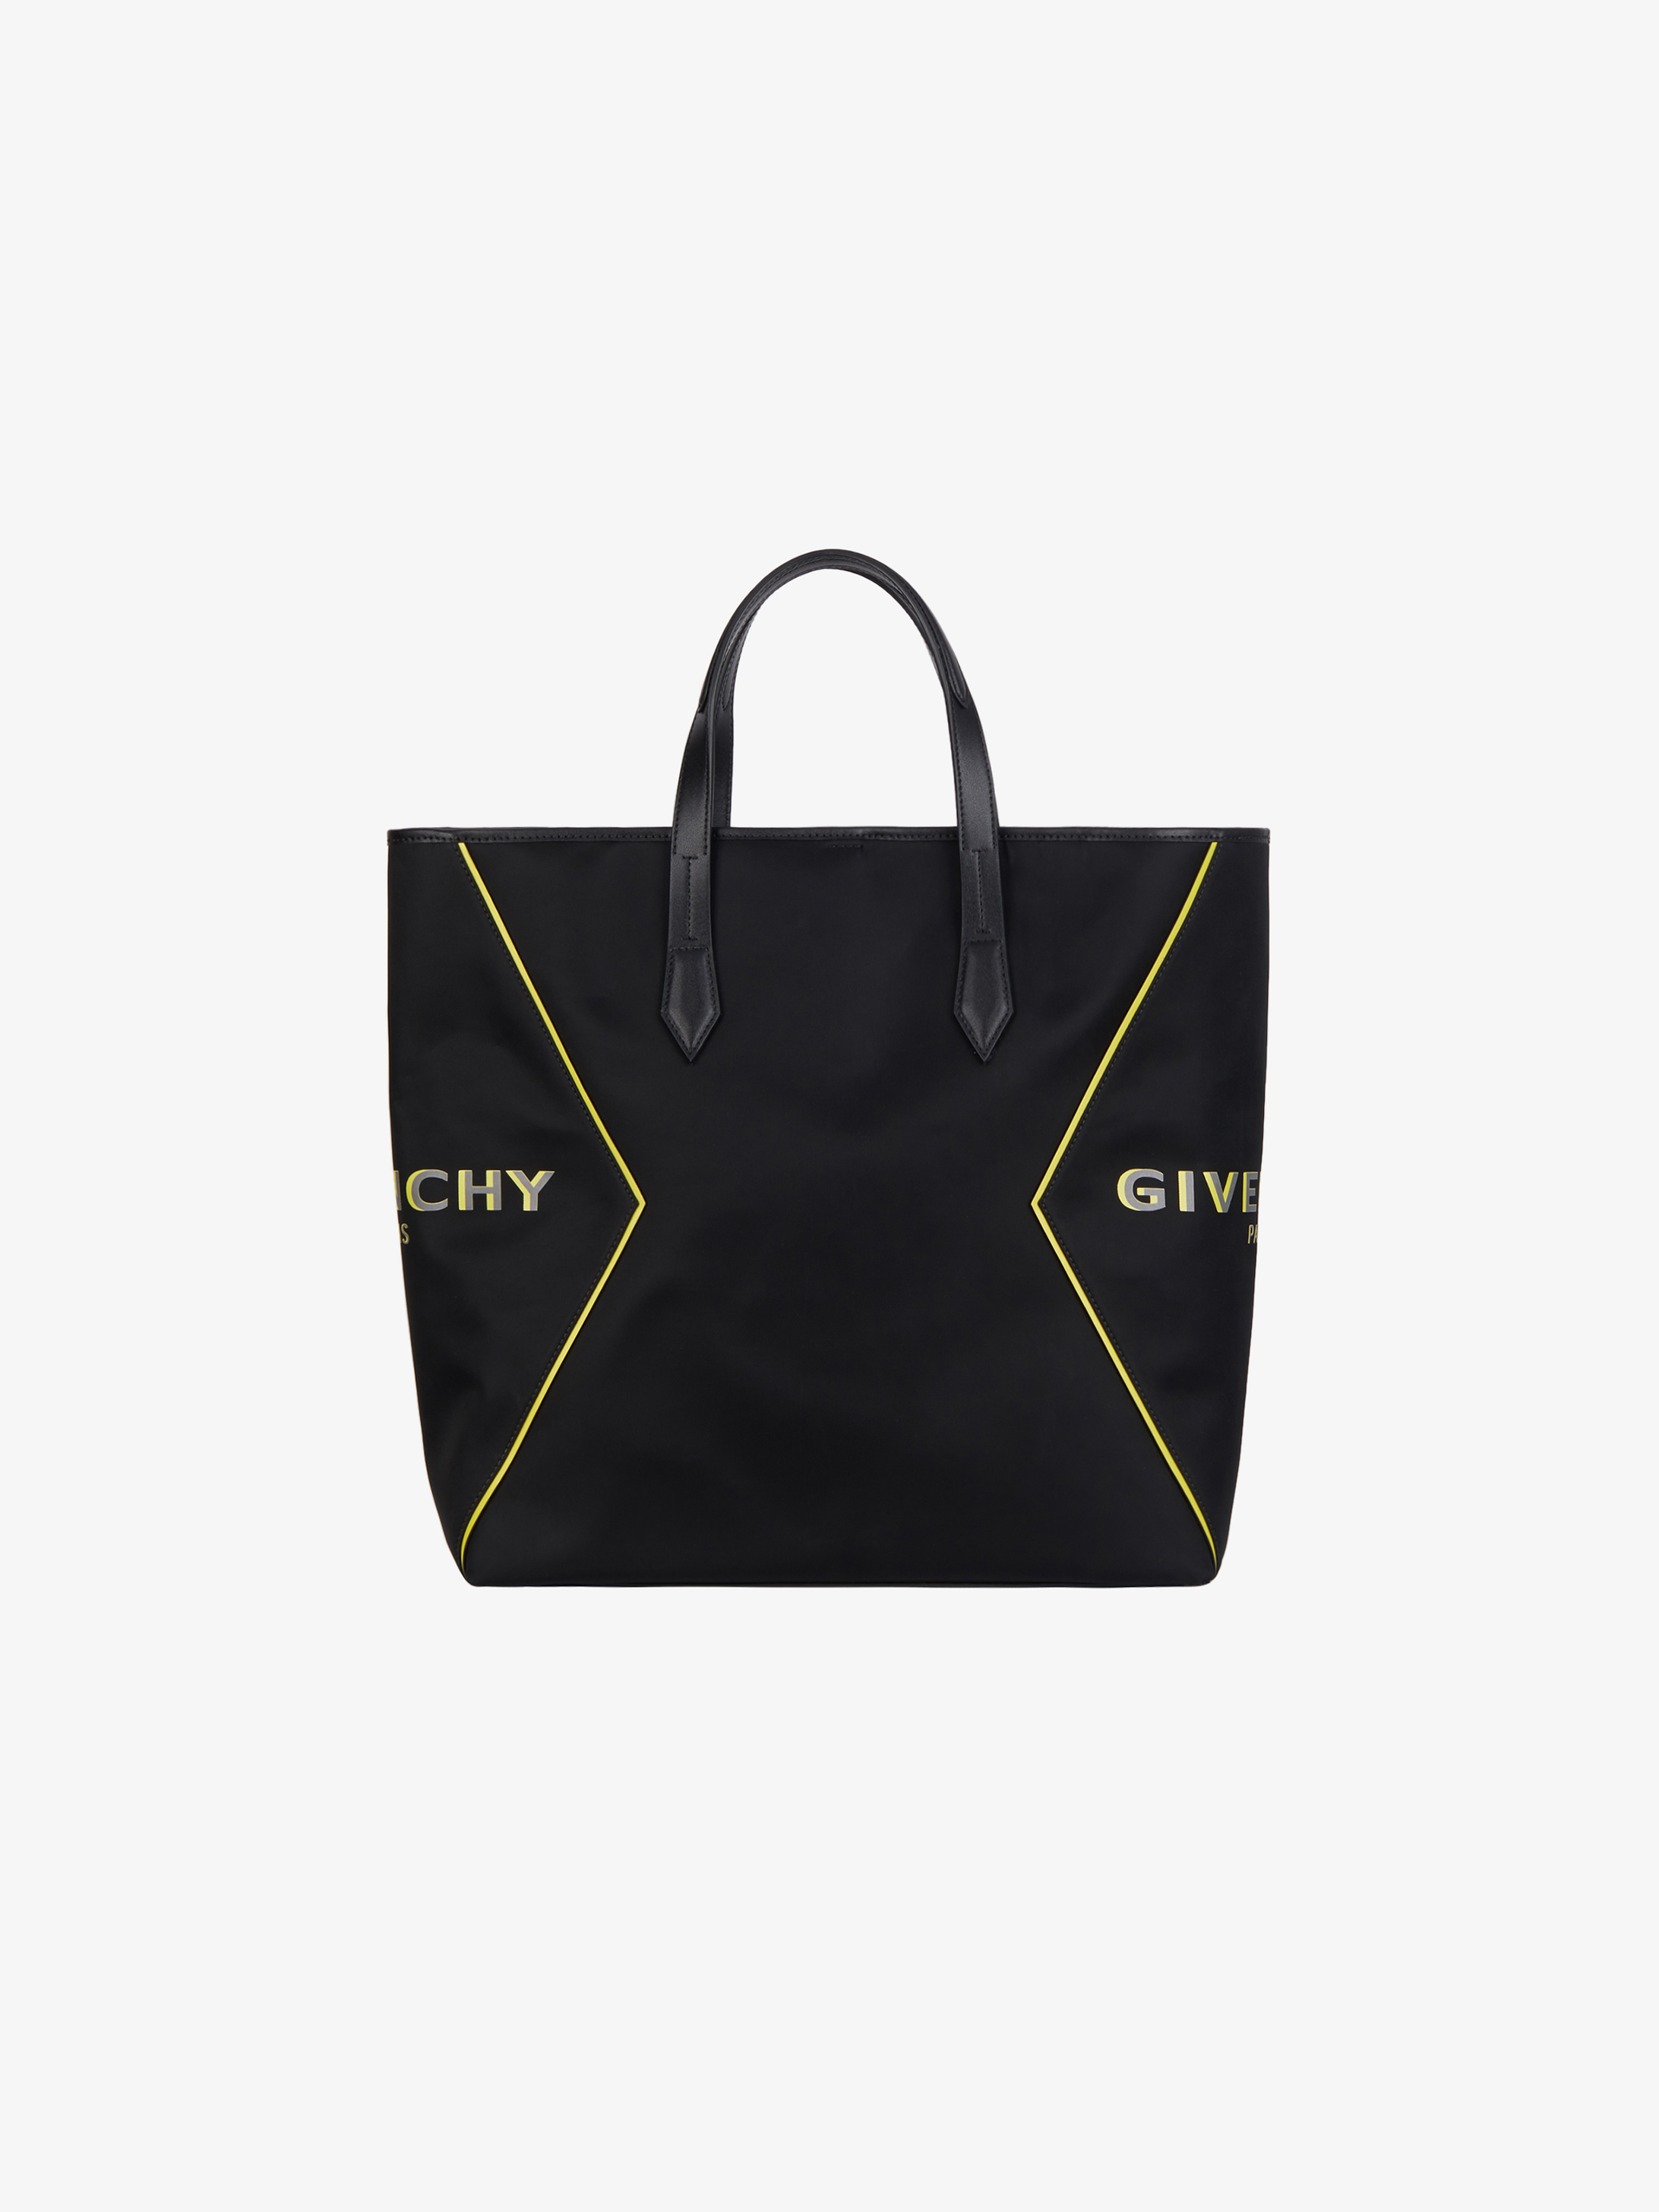 Bond GIVENCHY PARIS shopping bag in nylon